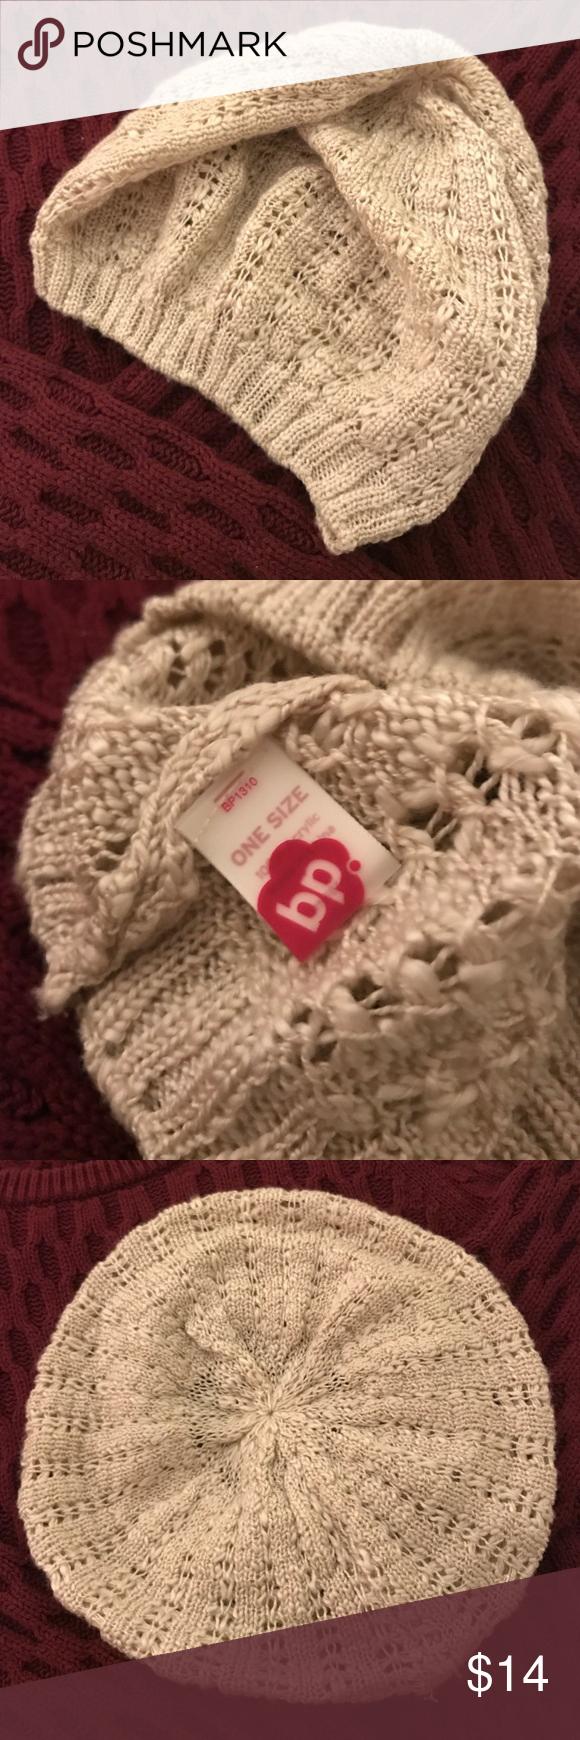 BP Knit Beret Lightweight knit beret frlm BP / excellent condition bp Accessories Hats